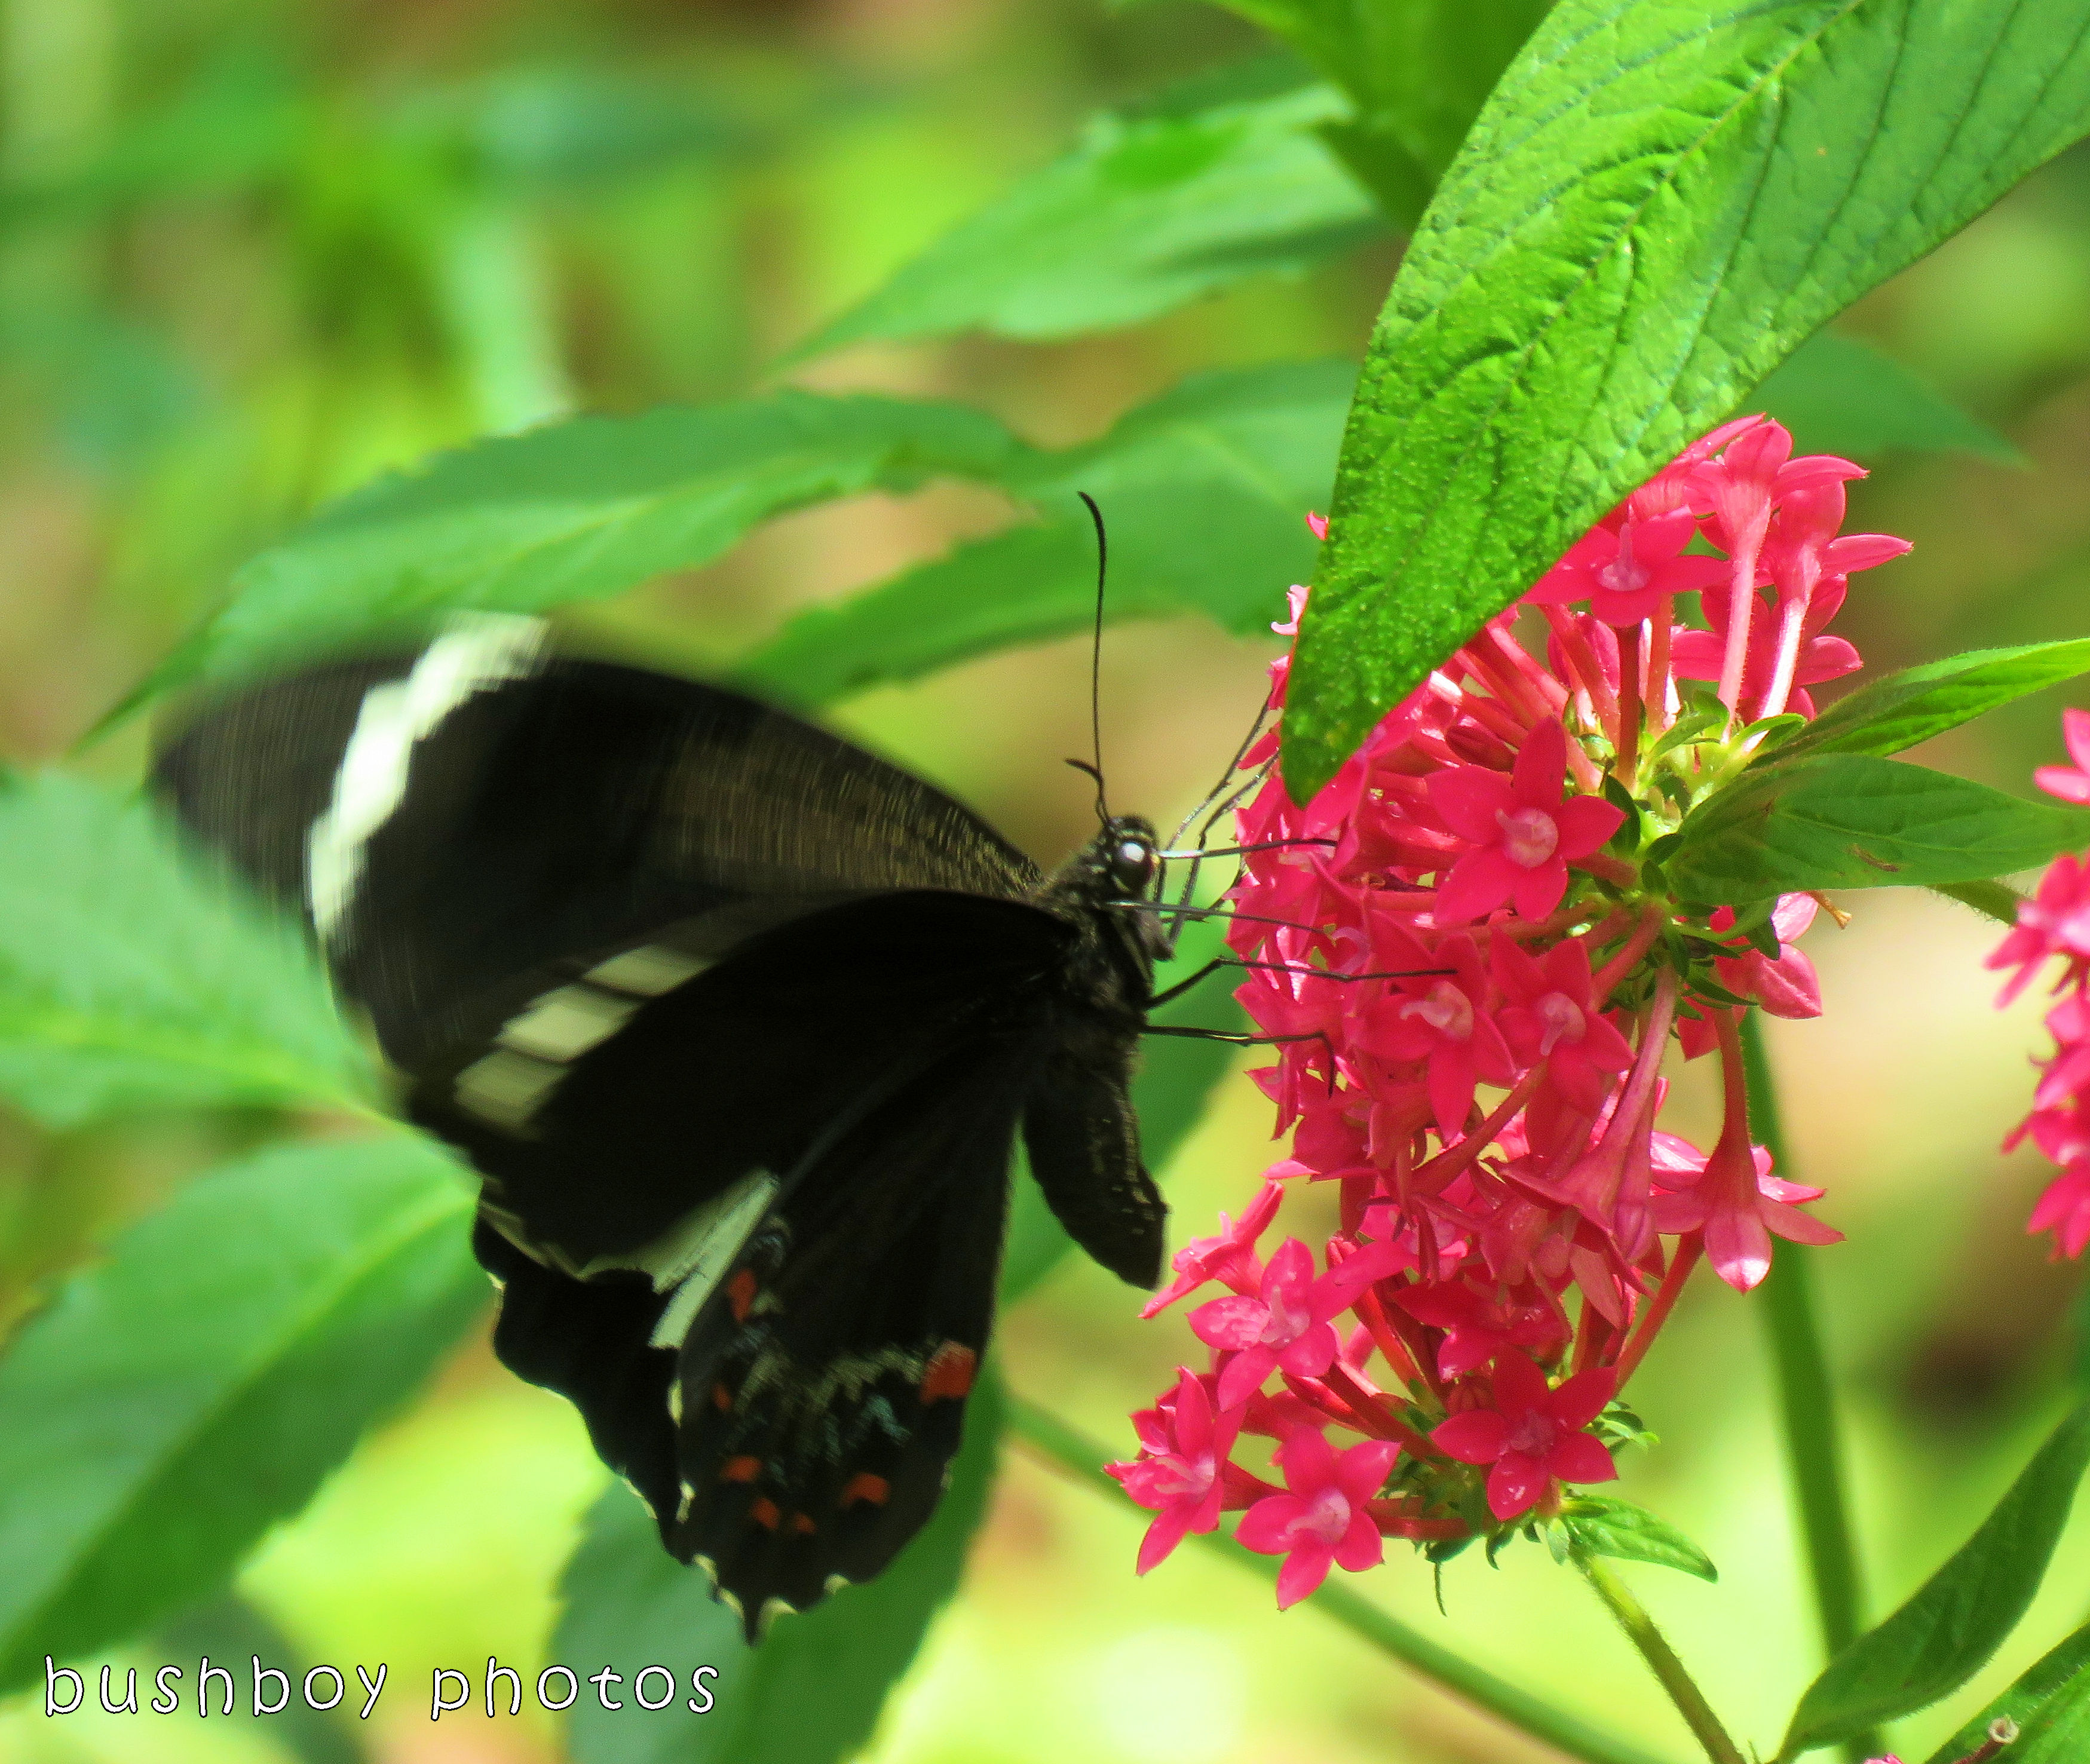 orchard swallowtail butterfly_named_binna burra_nov 2017